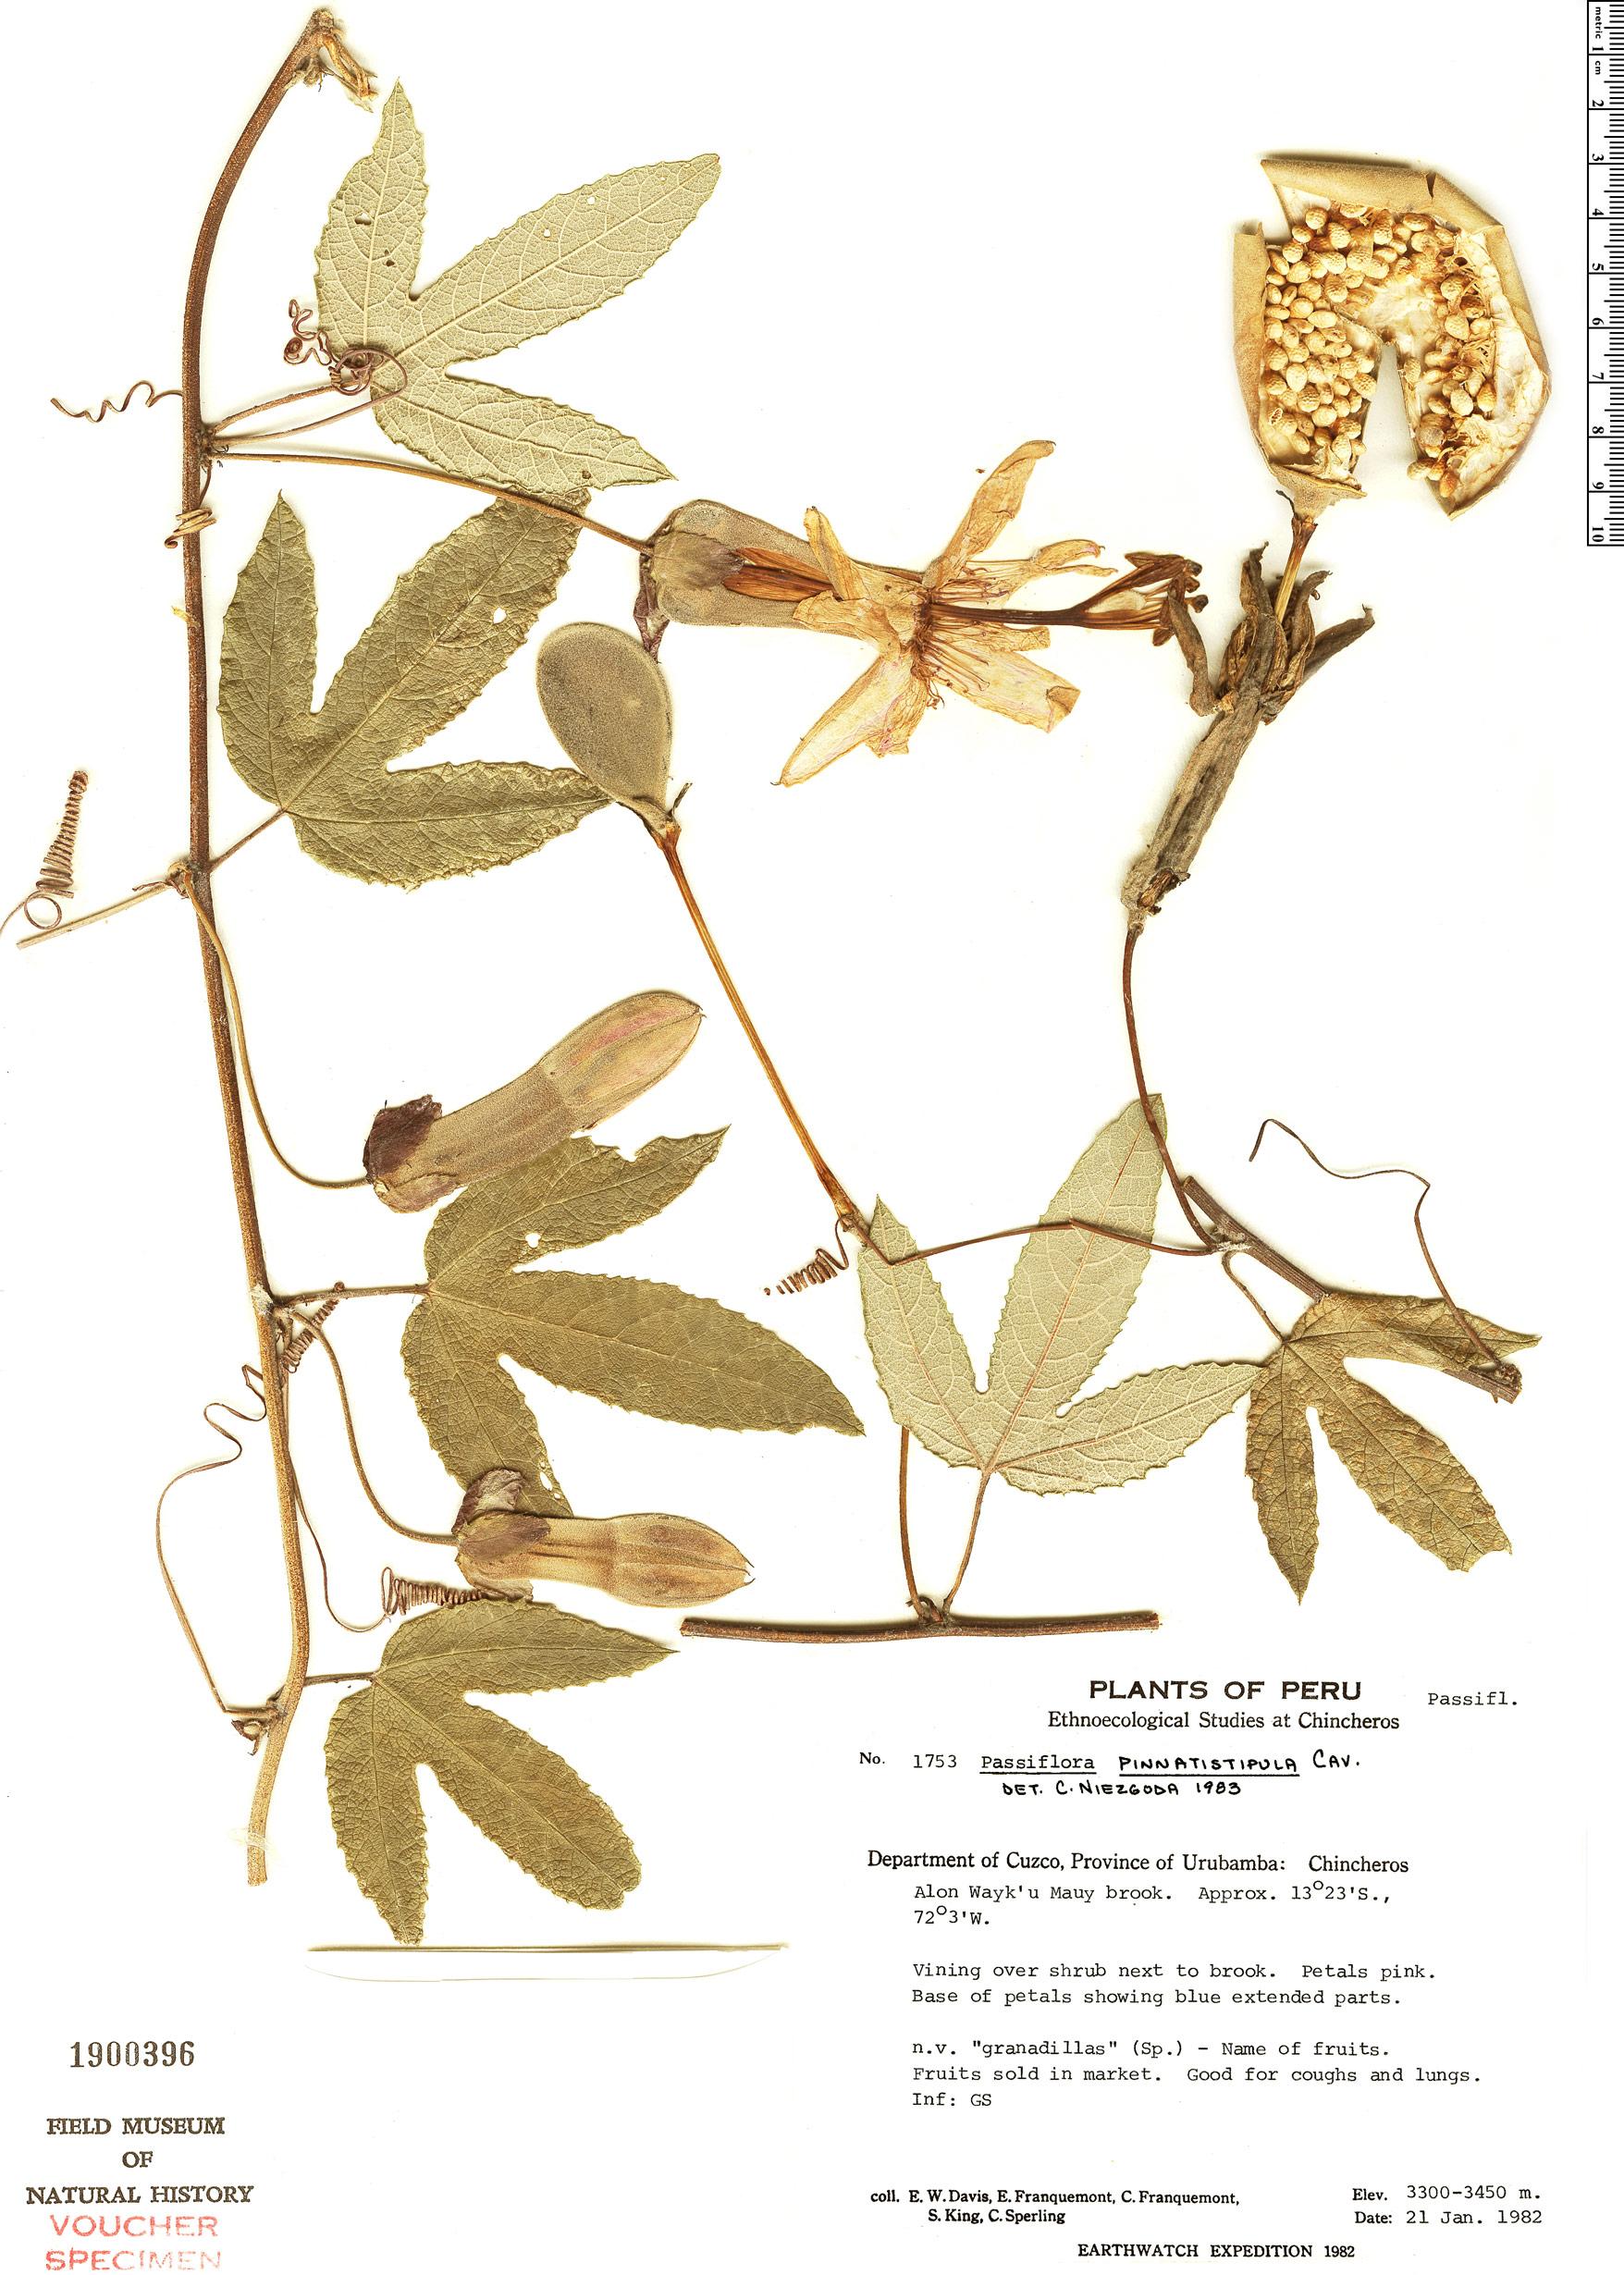 Espécime: Passiflora pinnatistipula